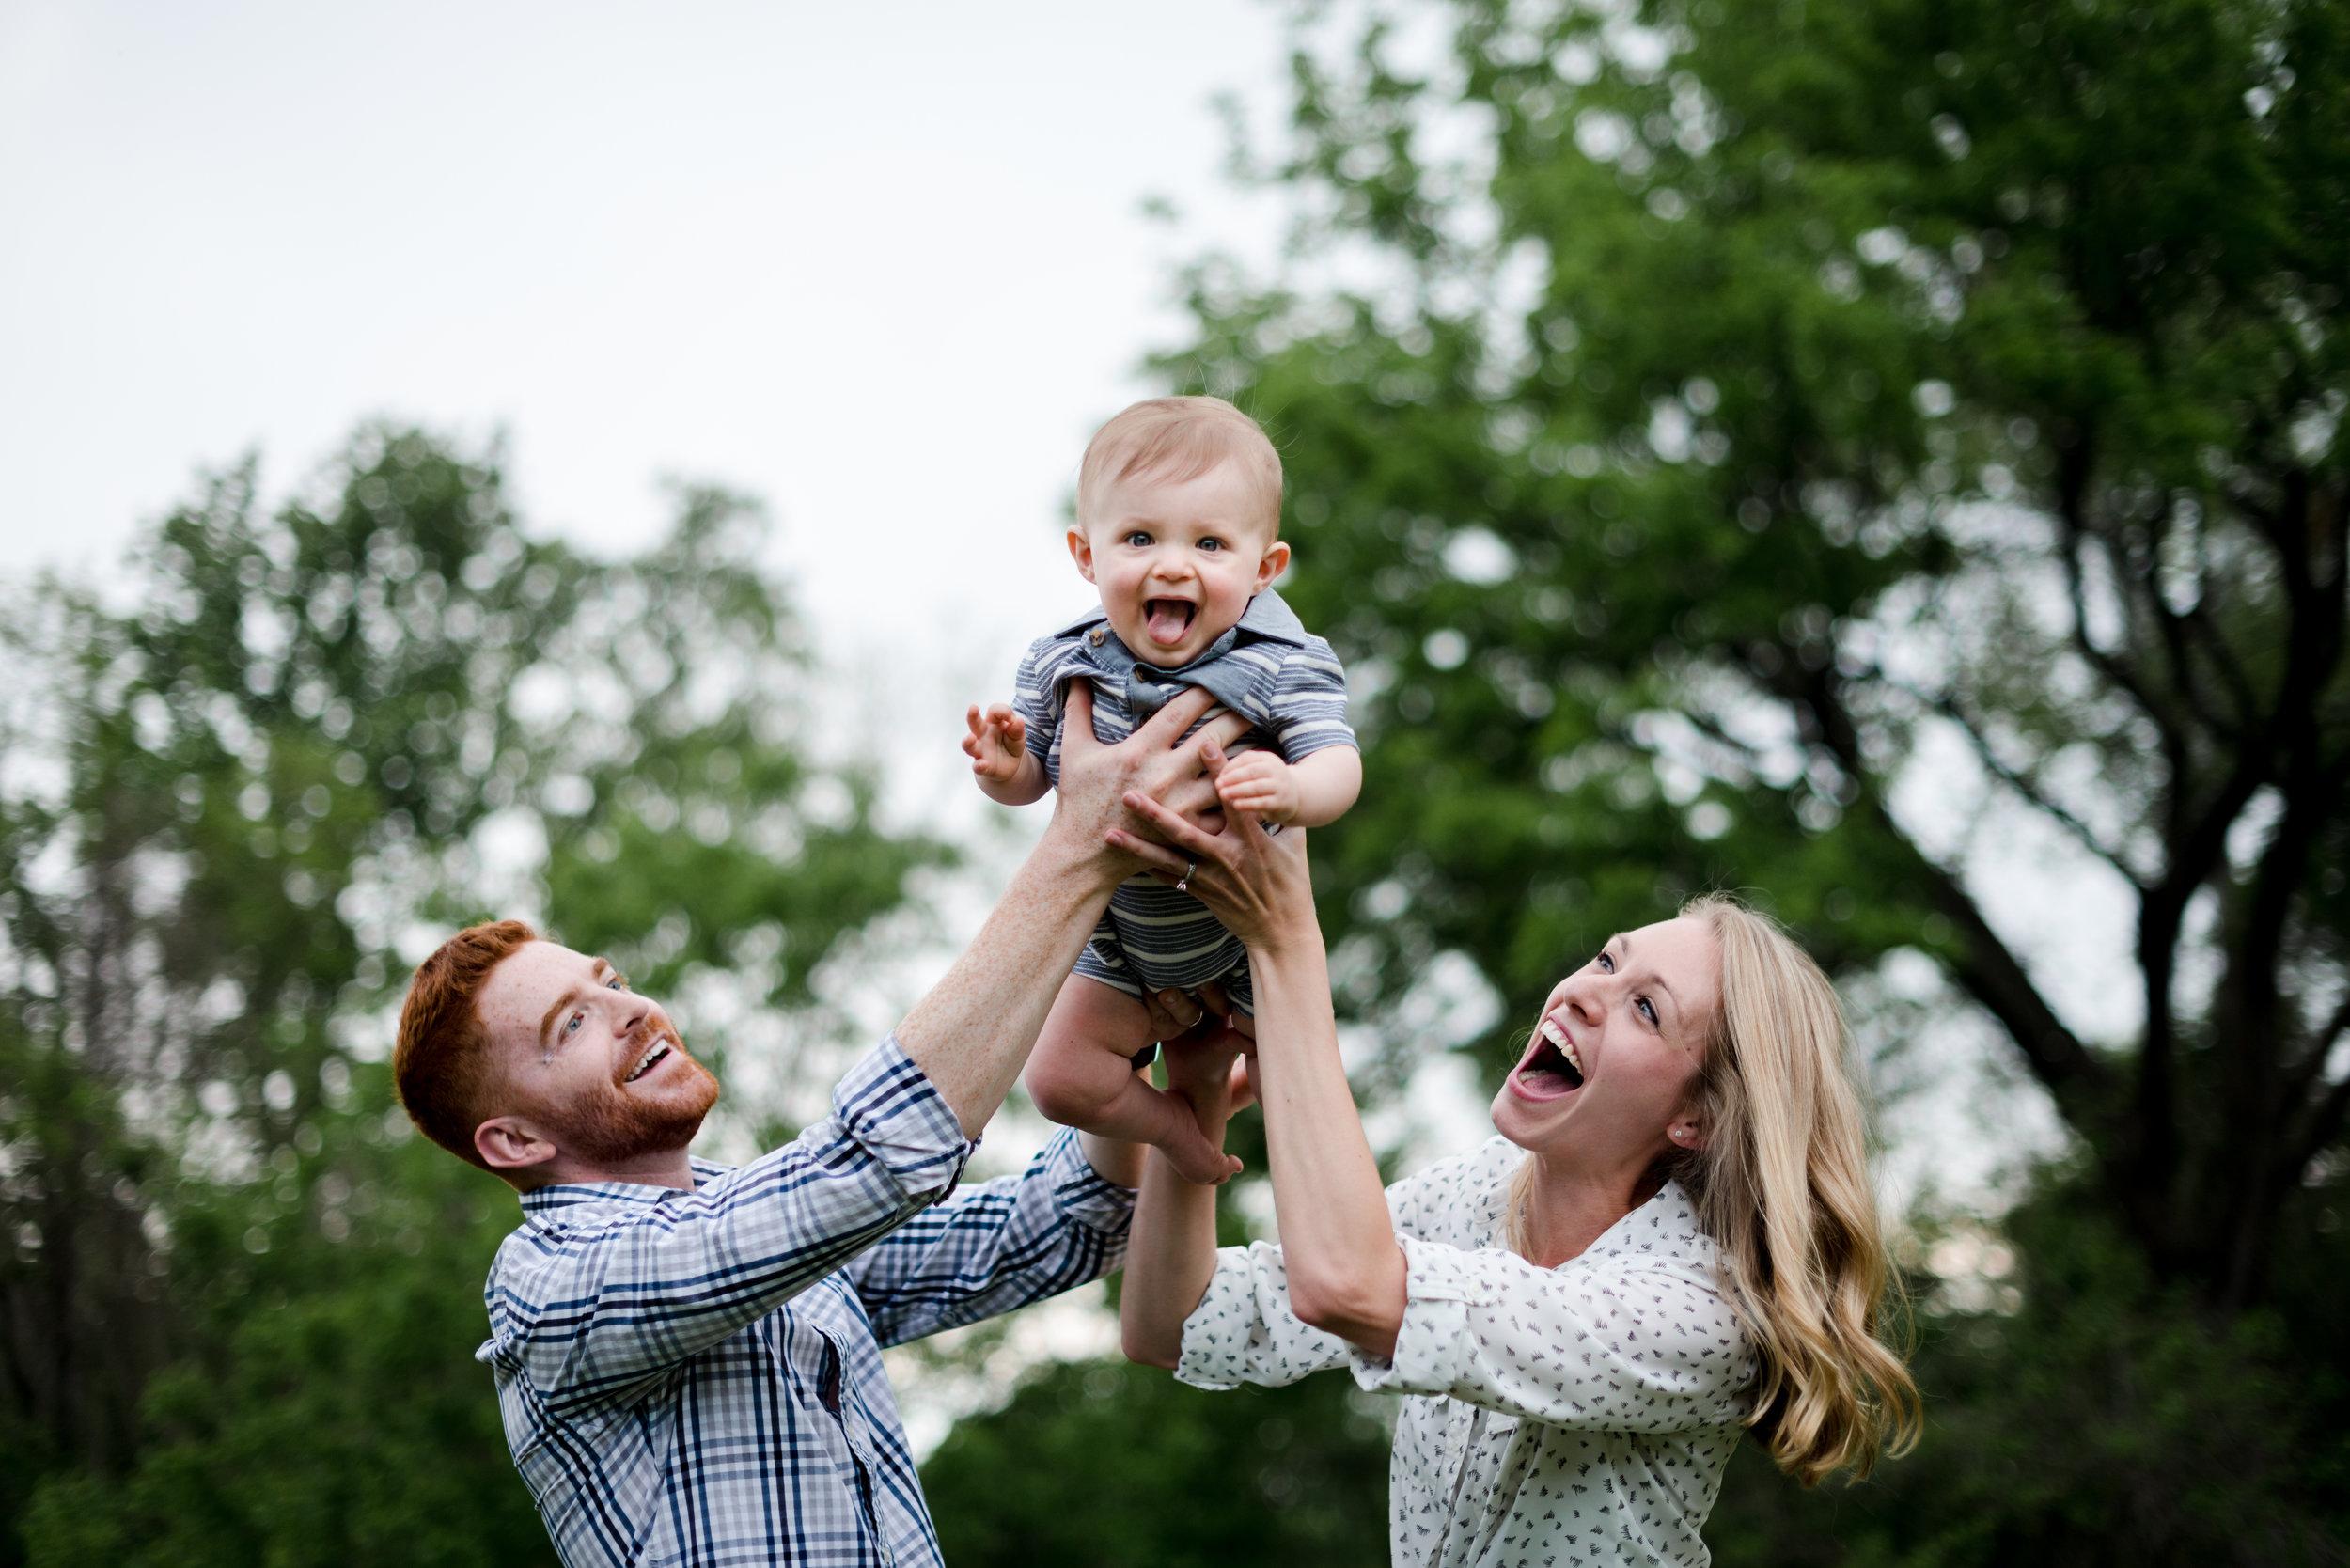 Kirsten-Smith-Photography-Barbush-Family-29.jpg